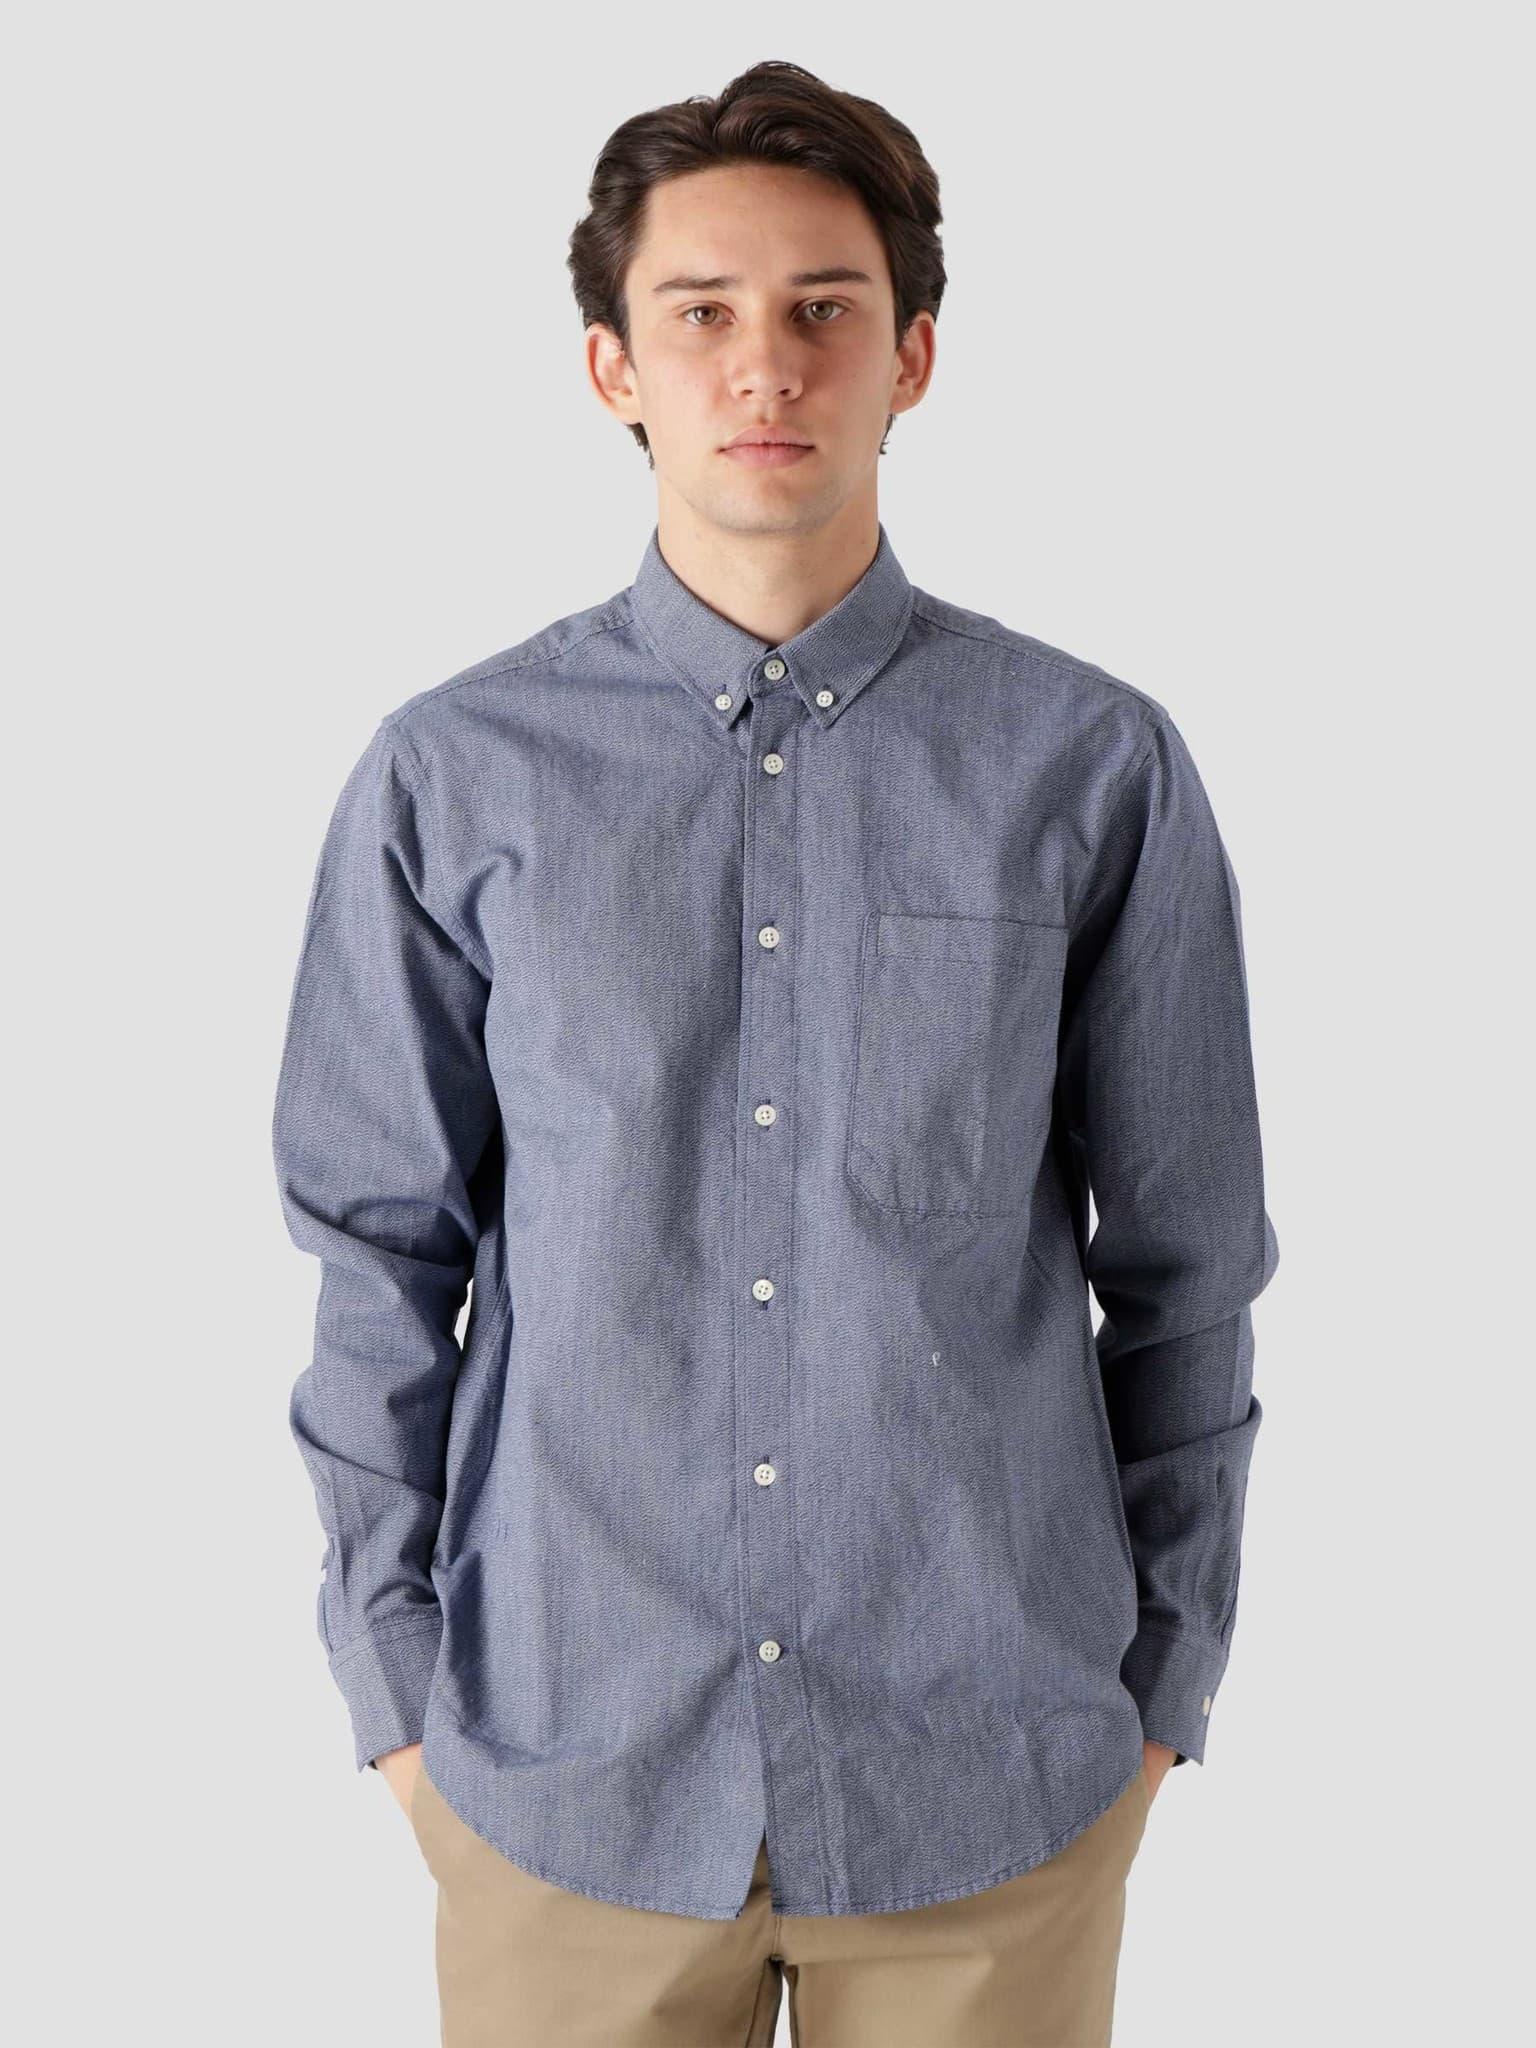 QB44 Stripe Shirt Navy Blue Textured